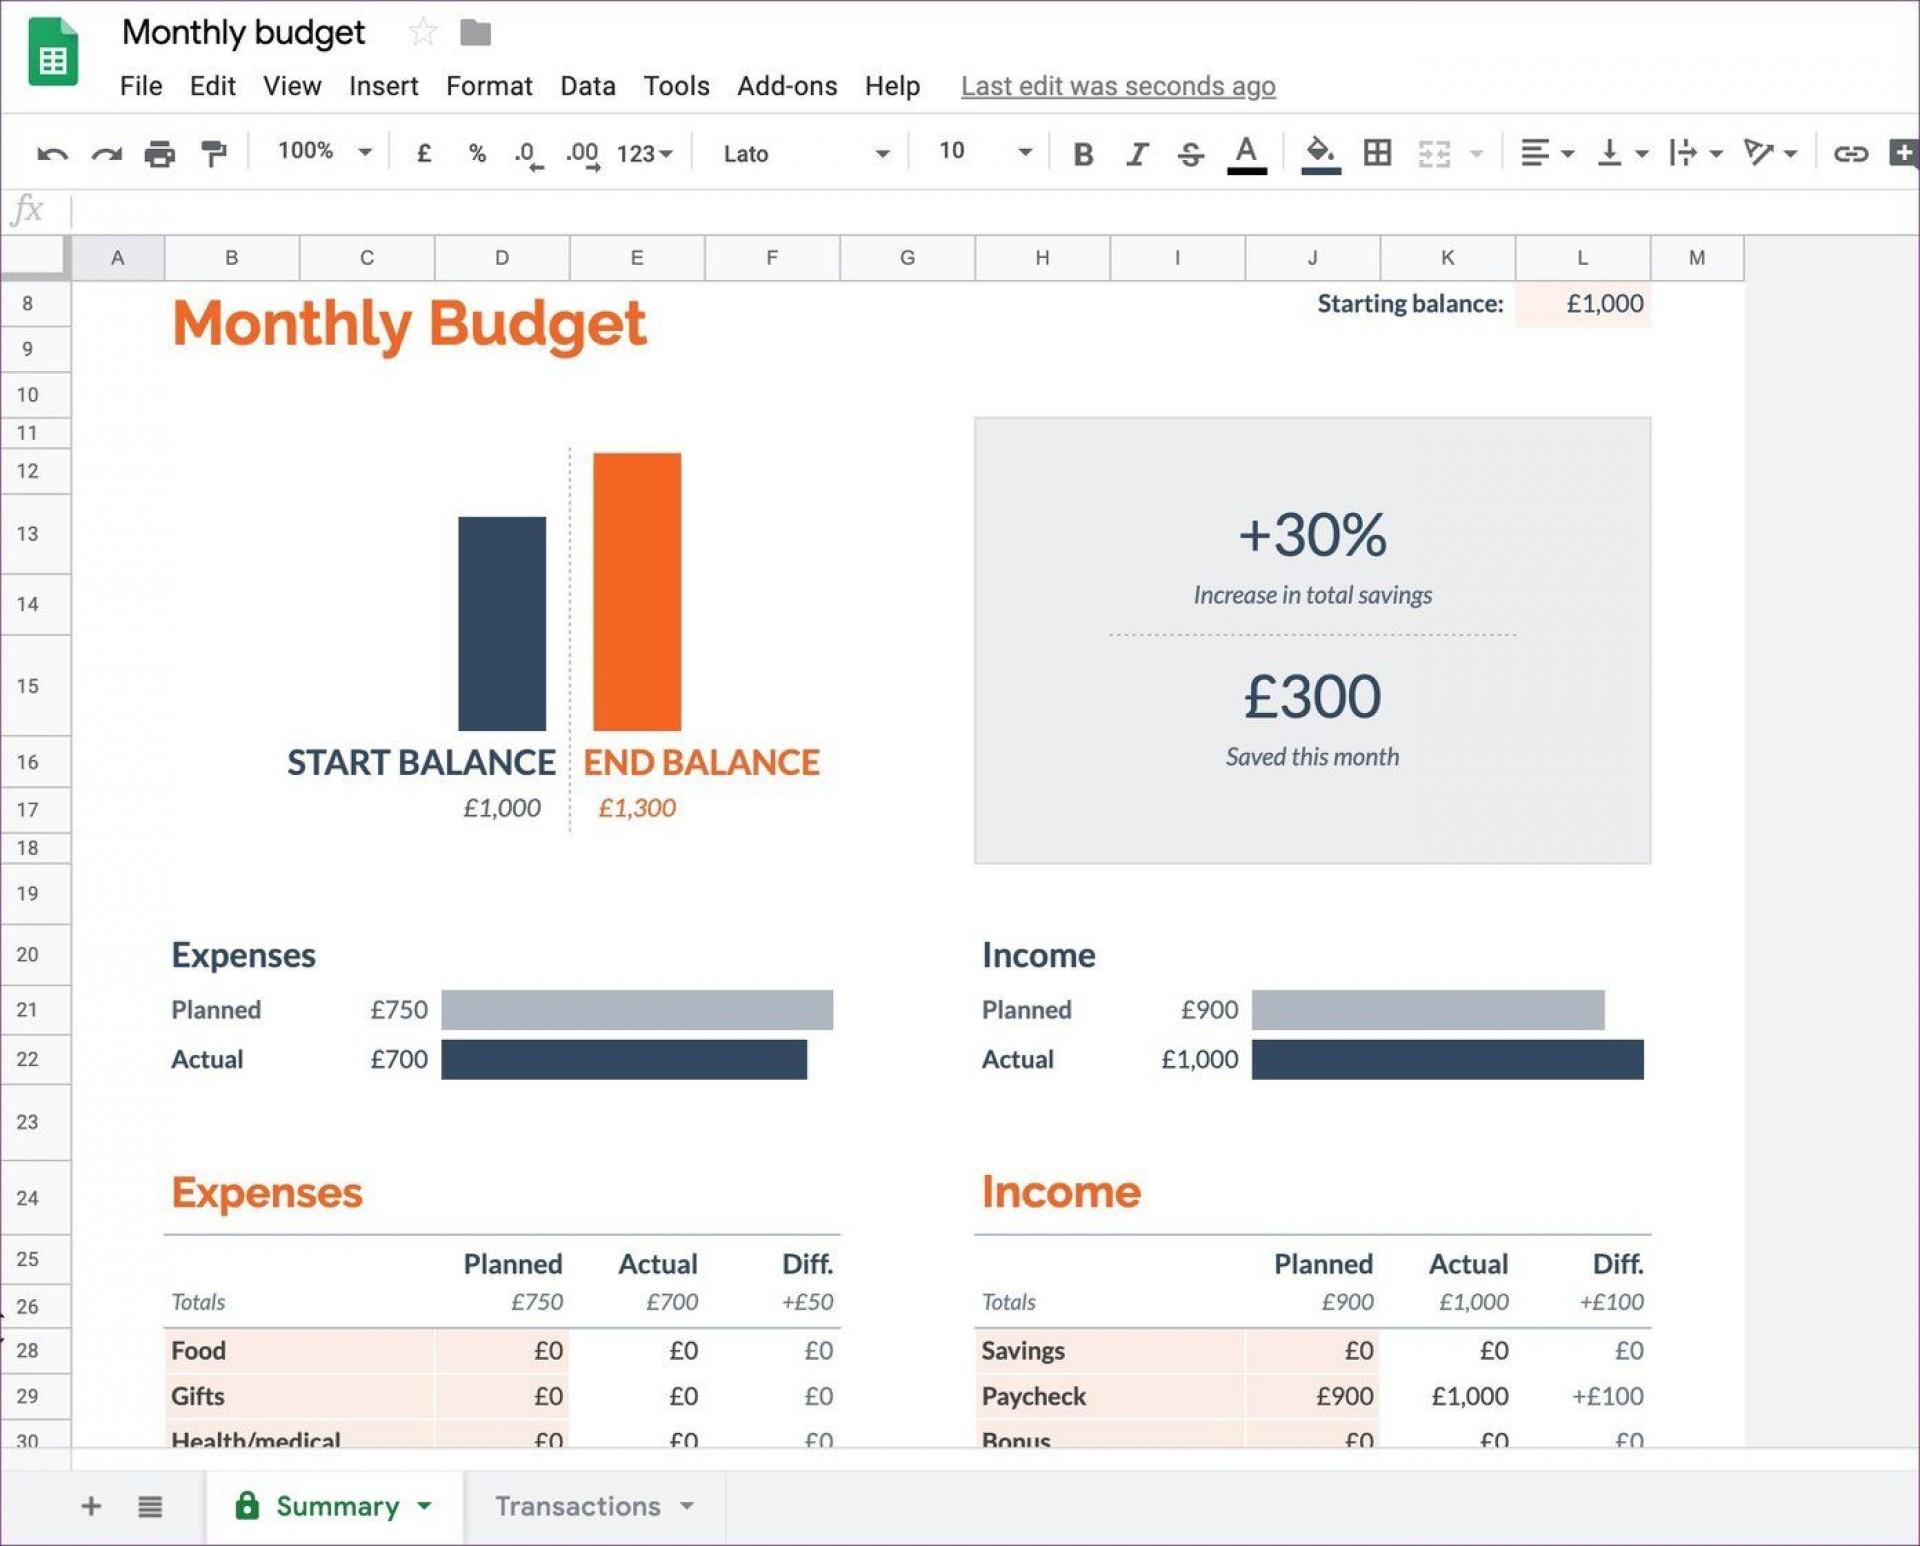 008 Phenomenal Free Monthly Budget Template Google Doc Image  Docs1920